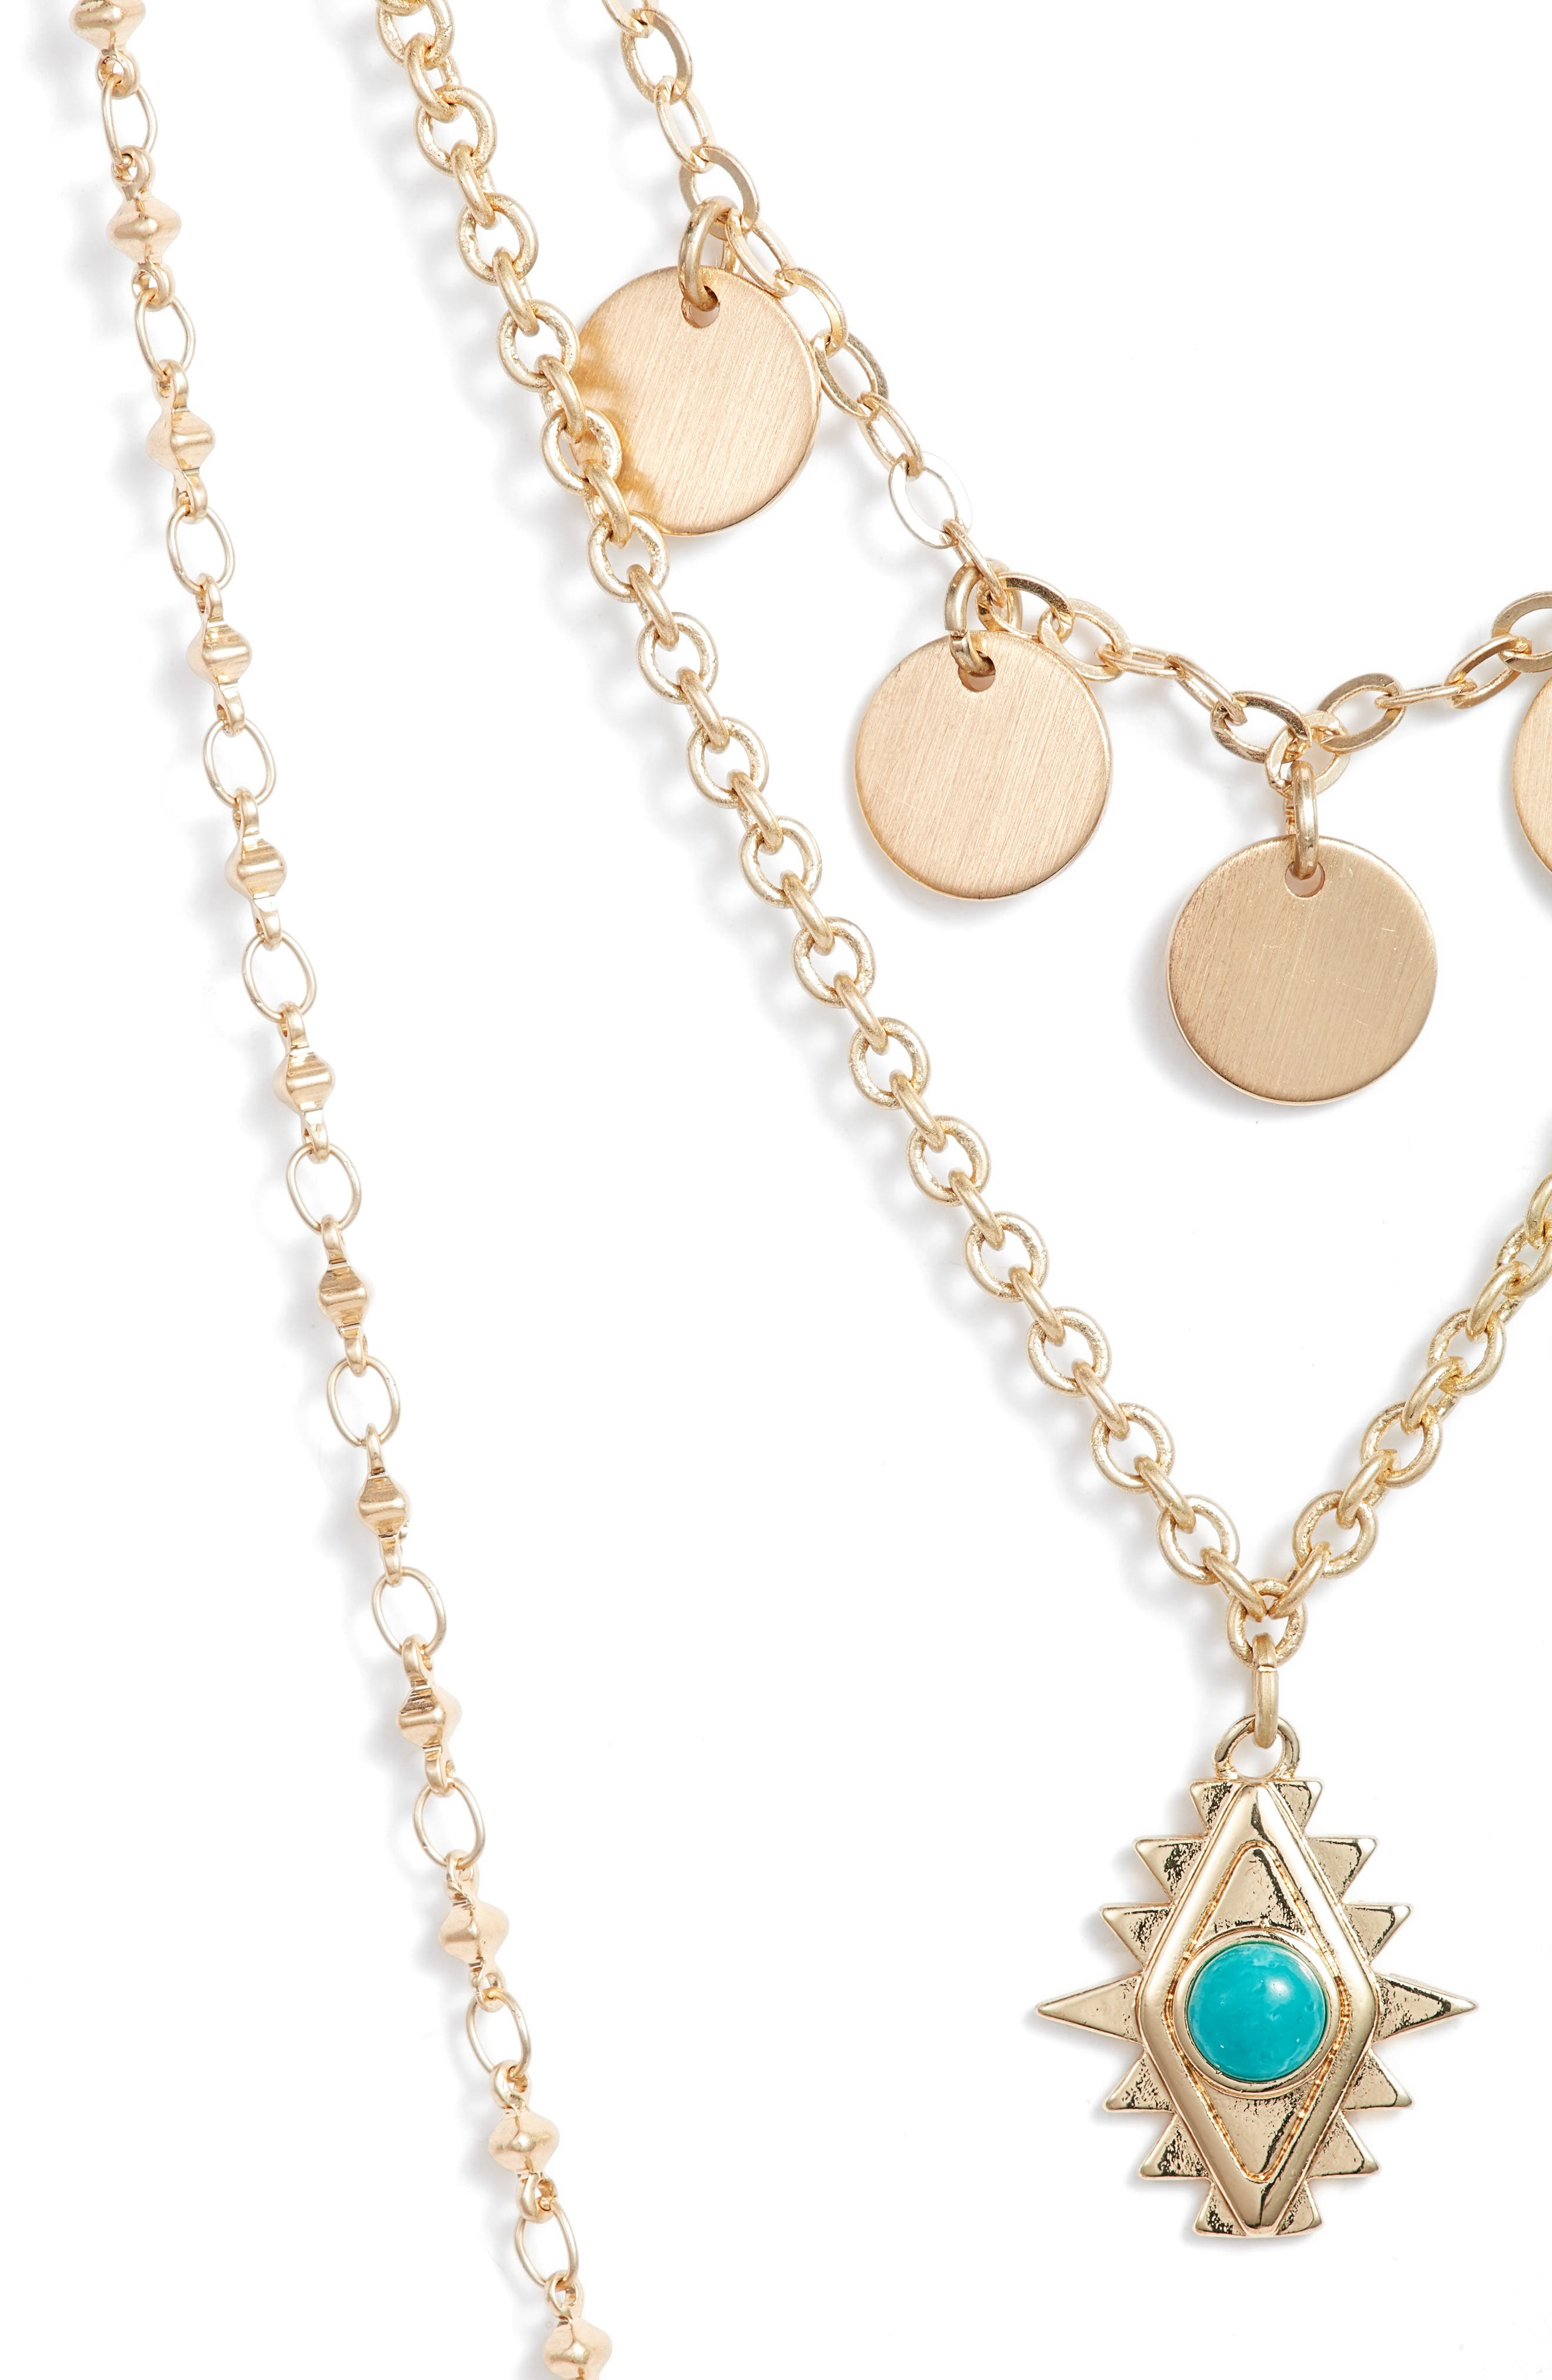 Triple Layer Charm Necklace,                             Alternate thumbnail 2, color,                             710